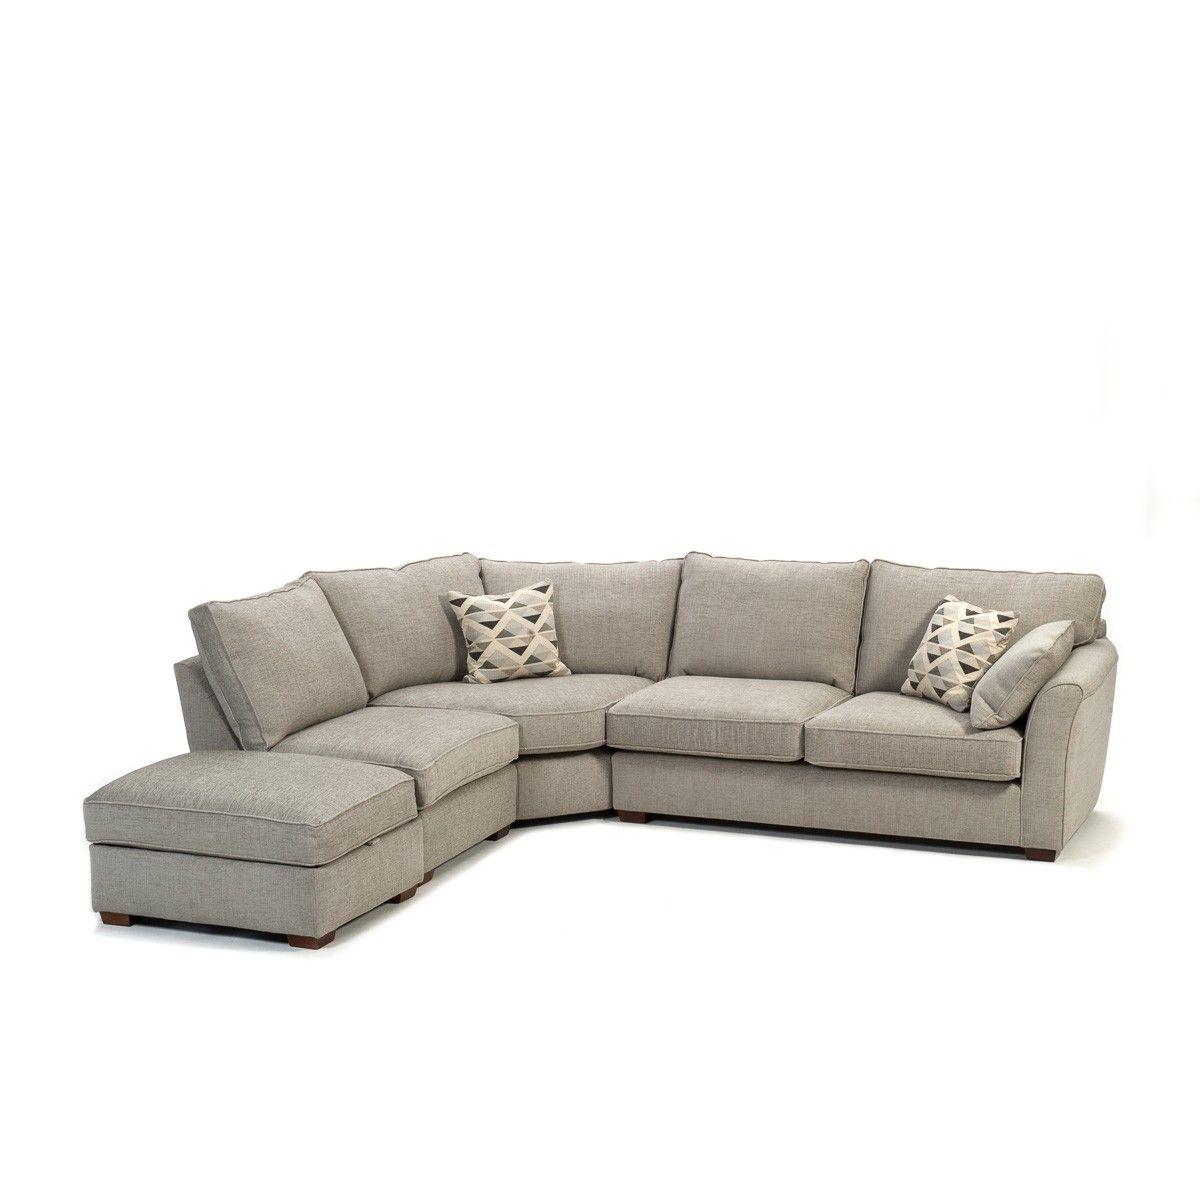 Irving Corner Sofa | Corner Sofas | Sofas | Caseys Furniture